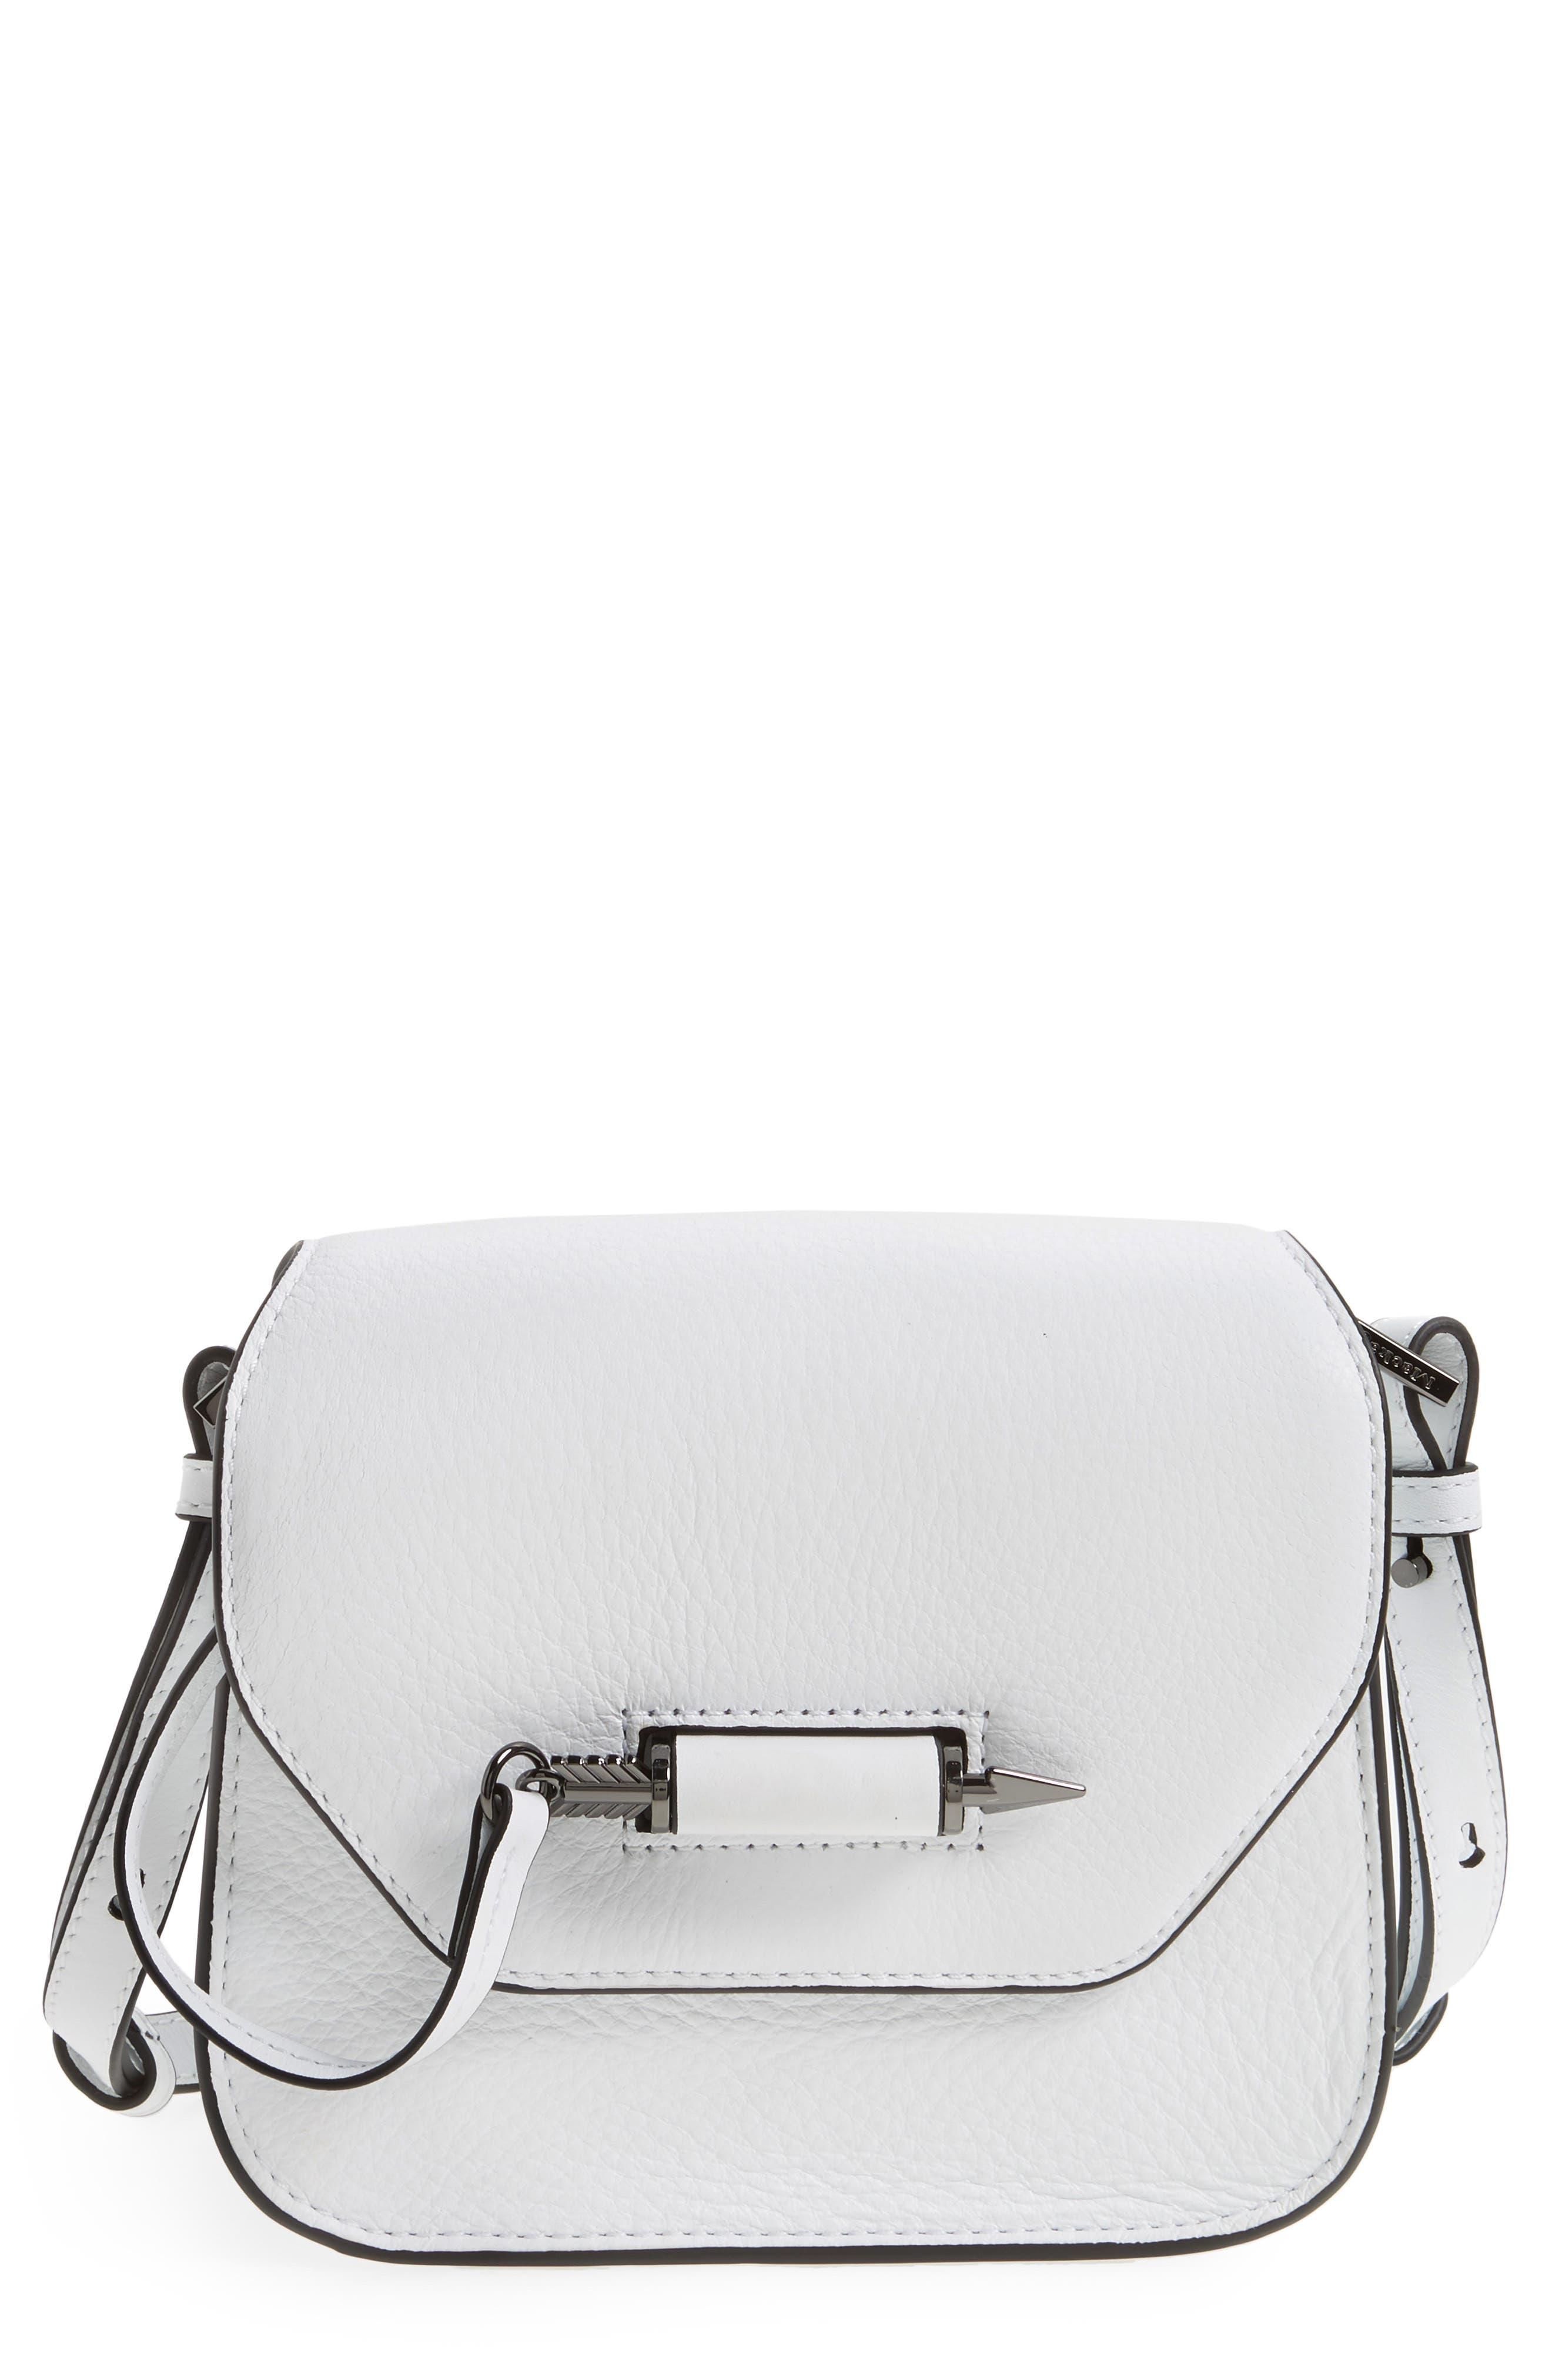 Mackage Mini Novacki Leather Crossbody Bag